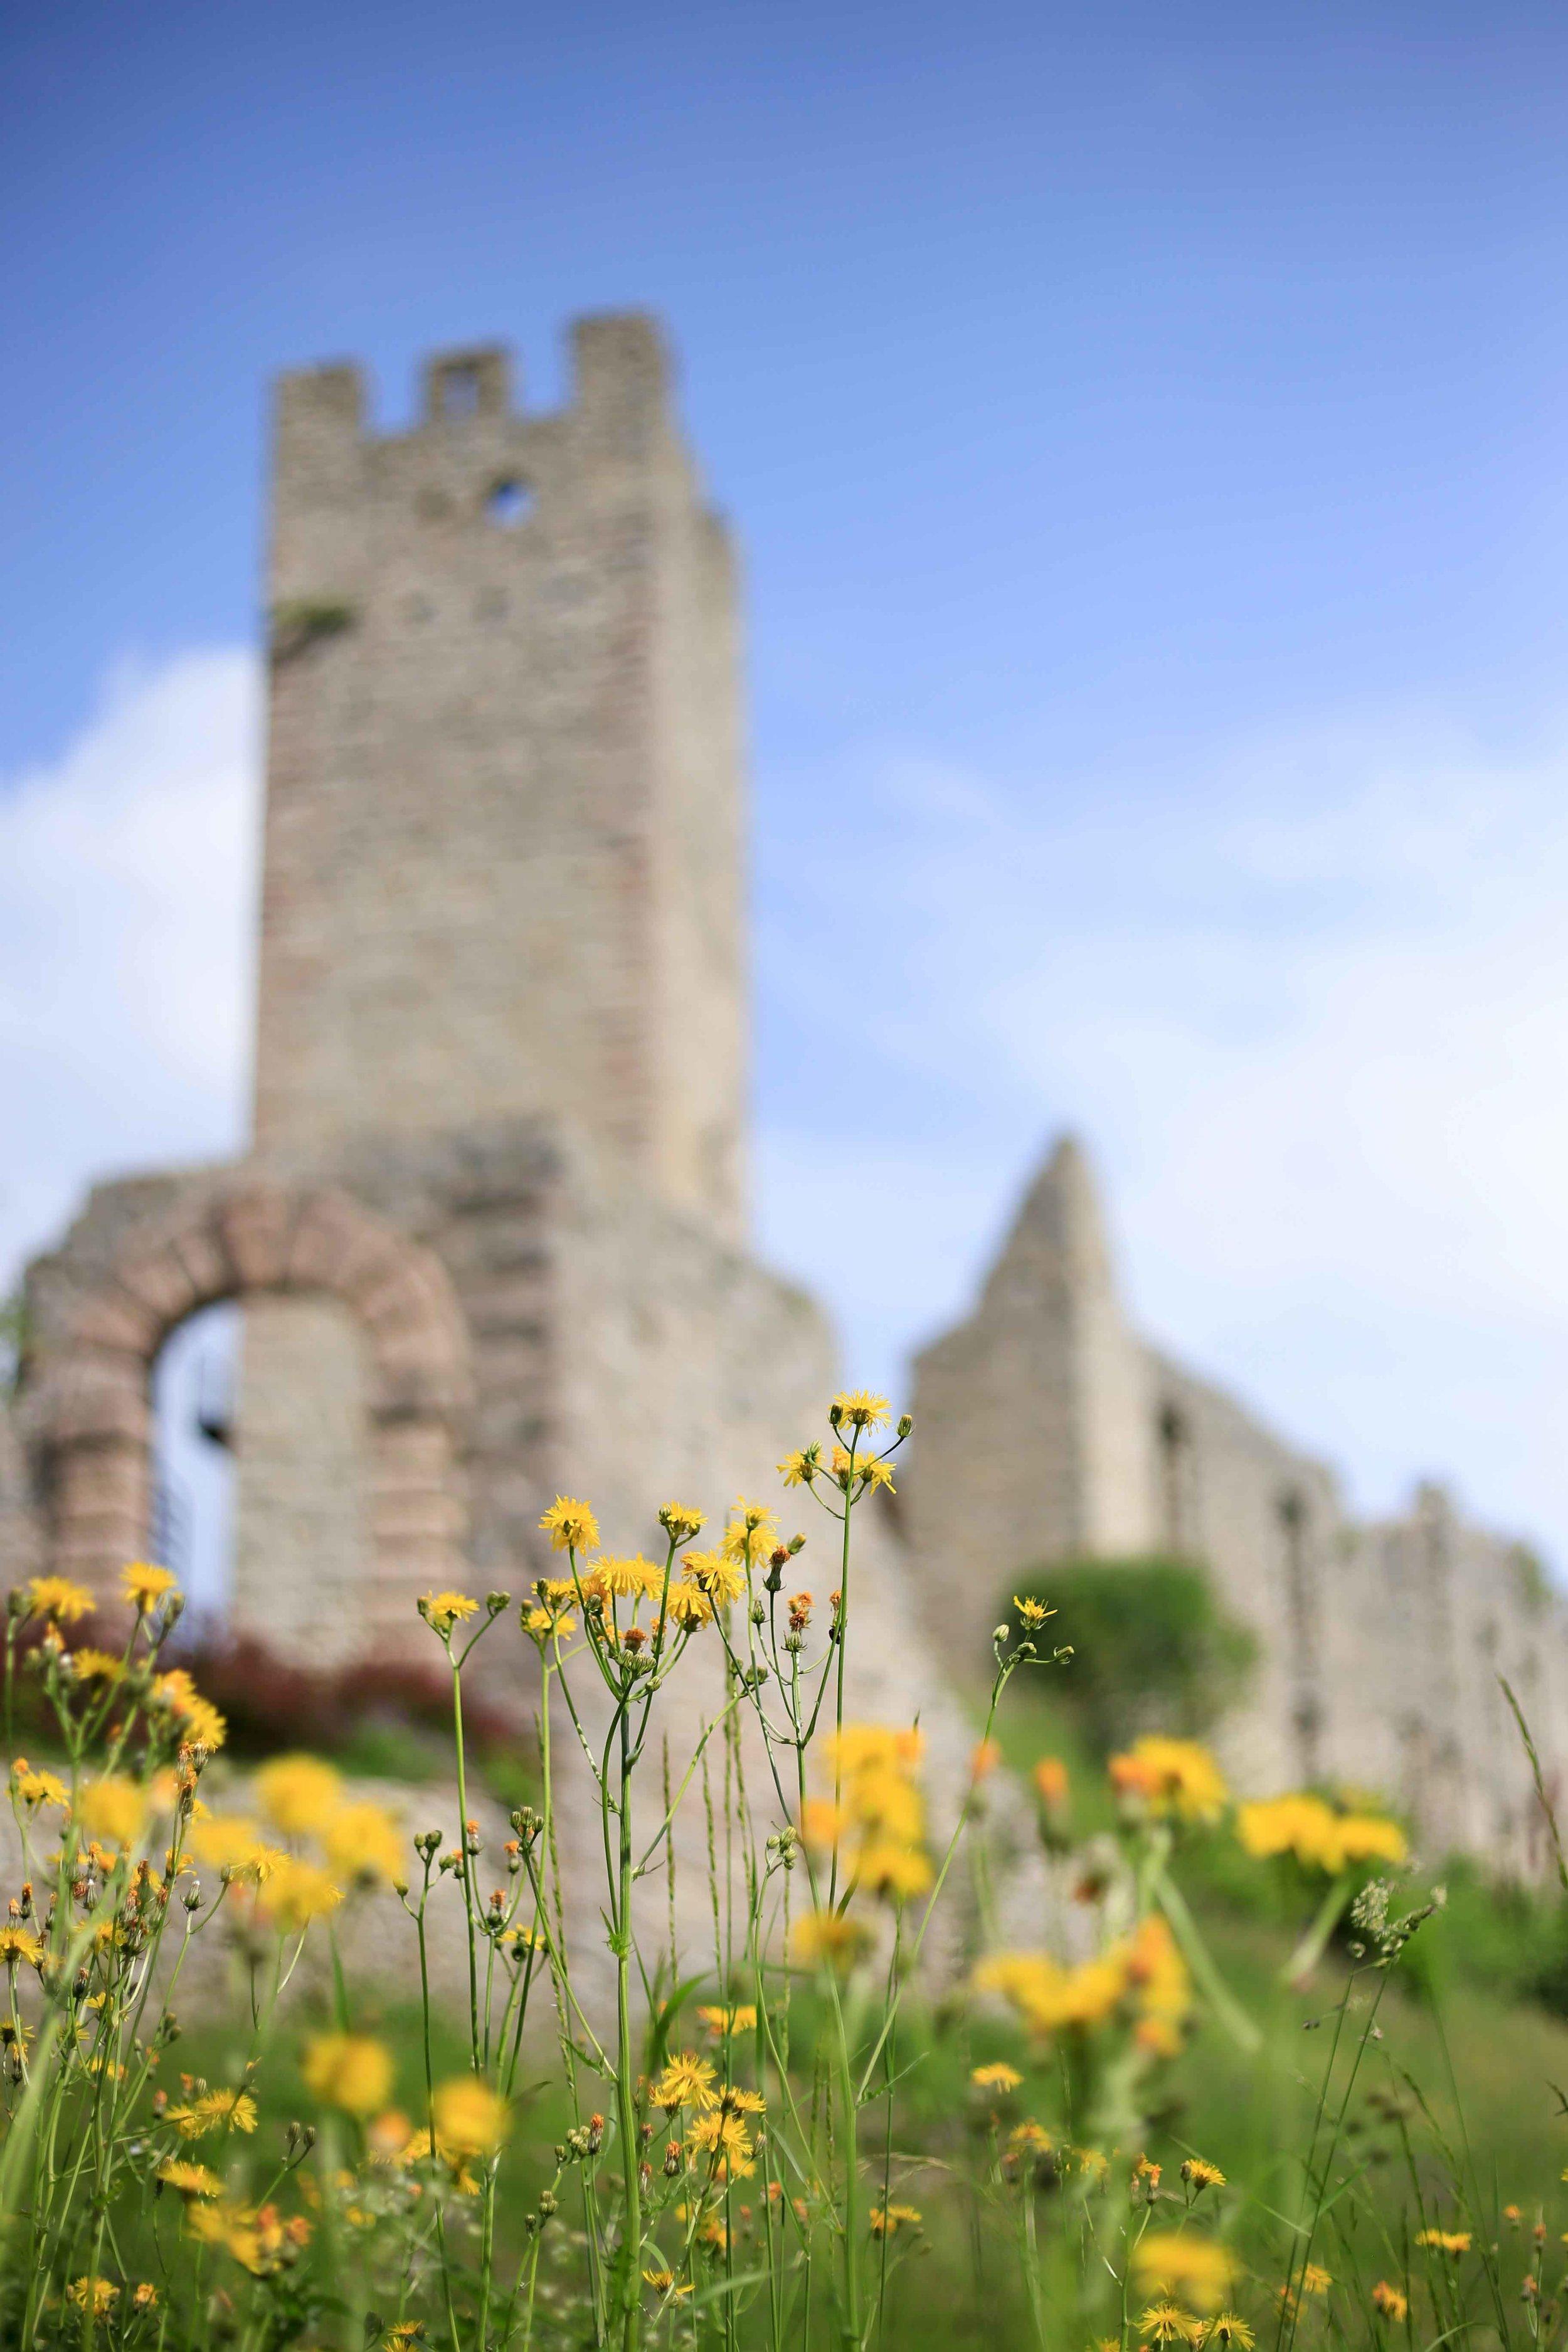 Field of dandelions in front of Belfort Castle.